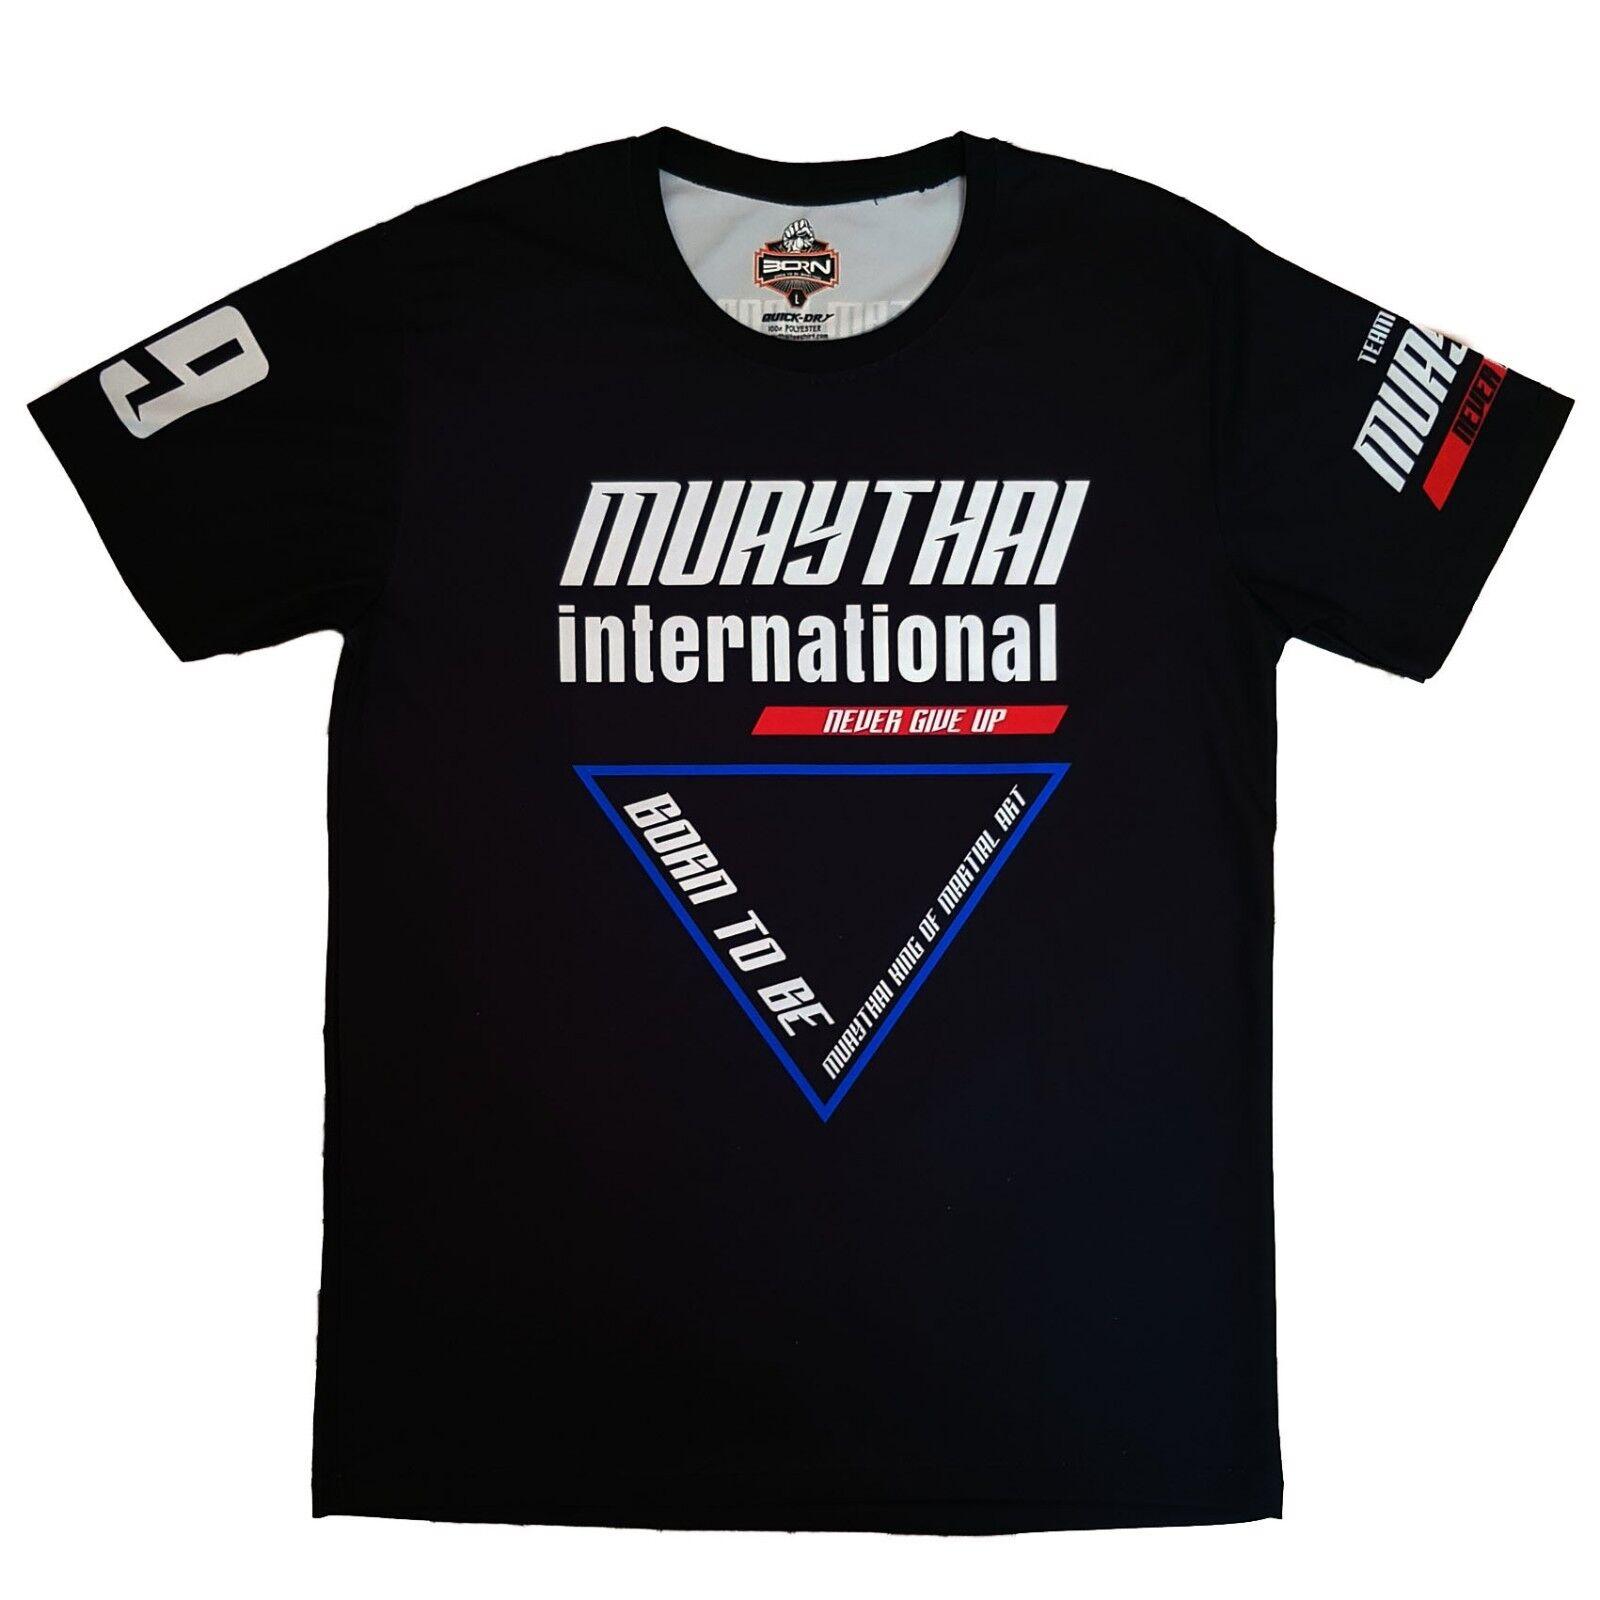 Muay Thai International International International T-Shirt Training Top Muay Thai Boxen Kampf T-Shirt 5da8df